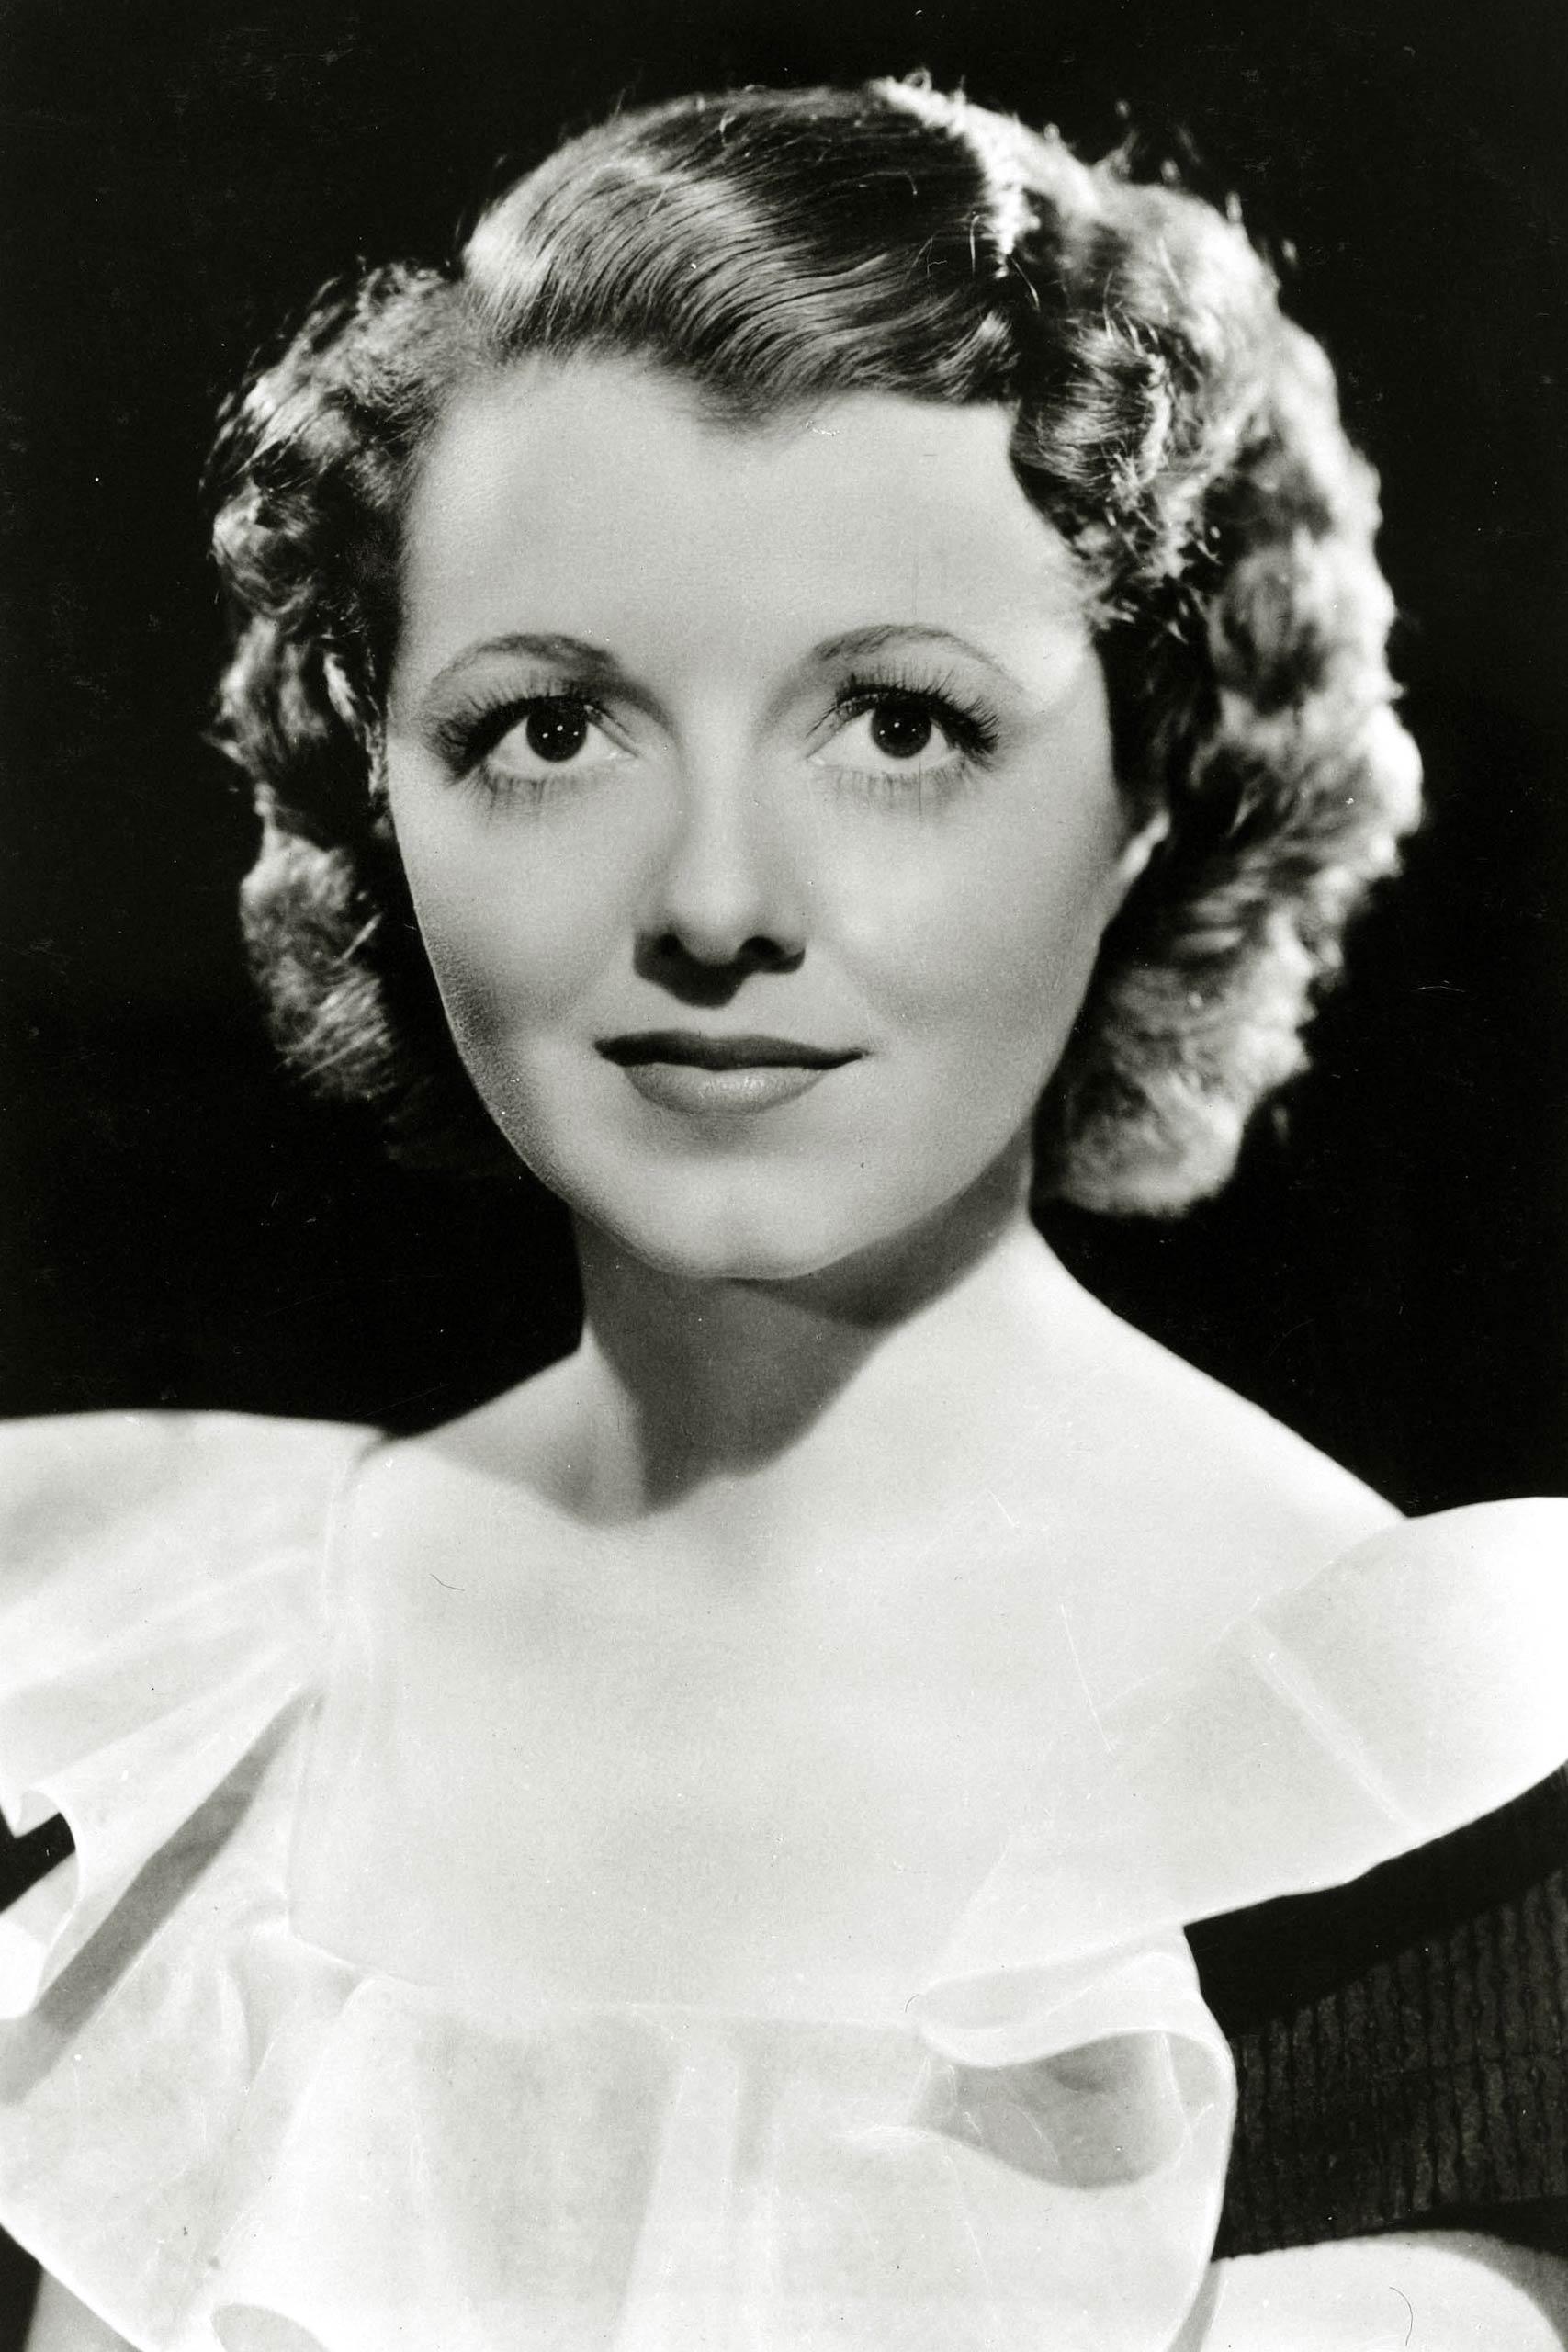 <strong>1929: Janet Gaynor - <i>Street Angel</i>, <i>Sunrise</i> and <i>7th Heaven</i></strong>